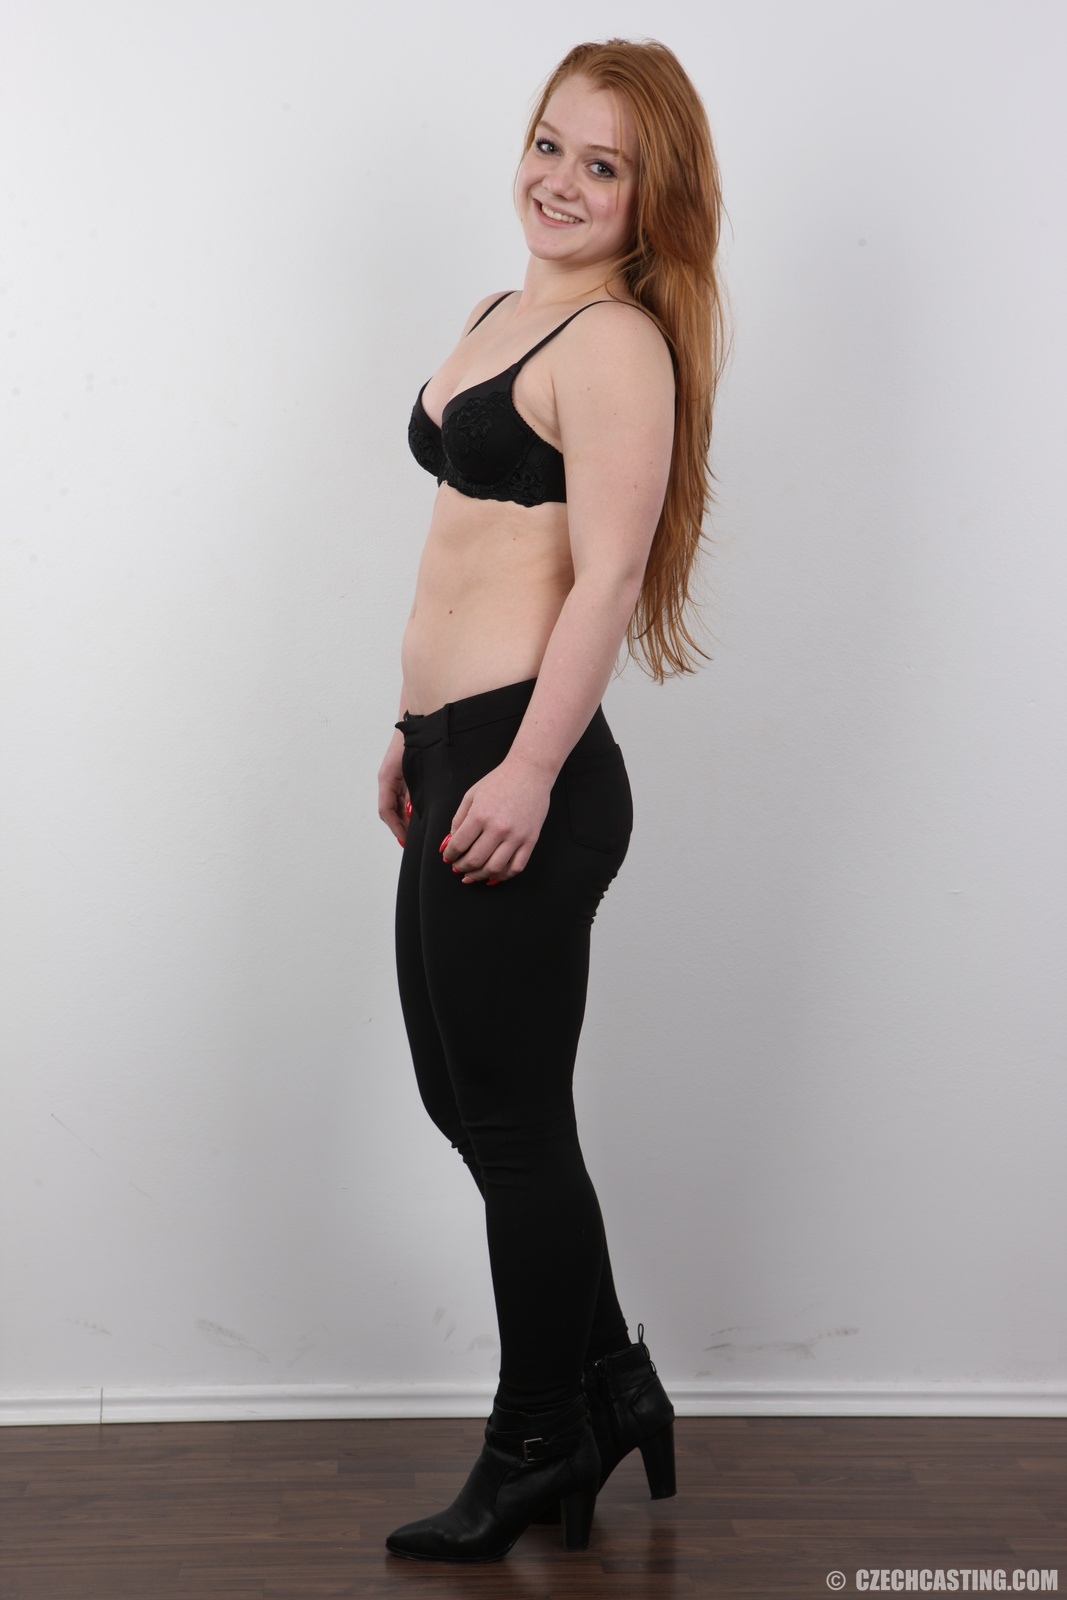 wpid-18-year-old-eliska-casting-photos9.jpg